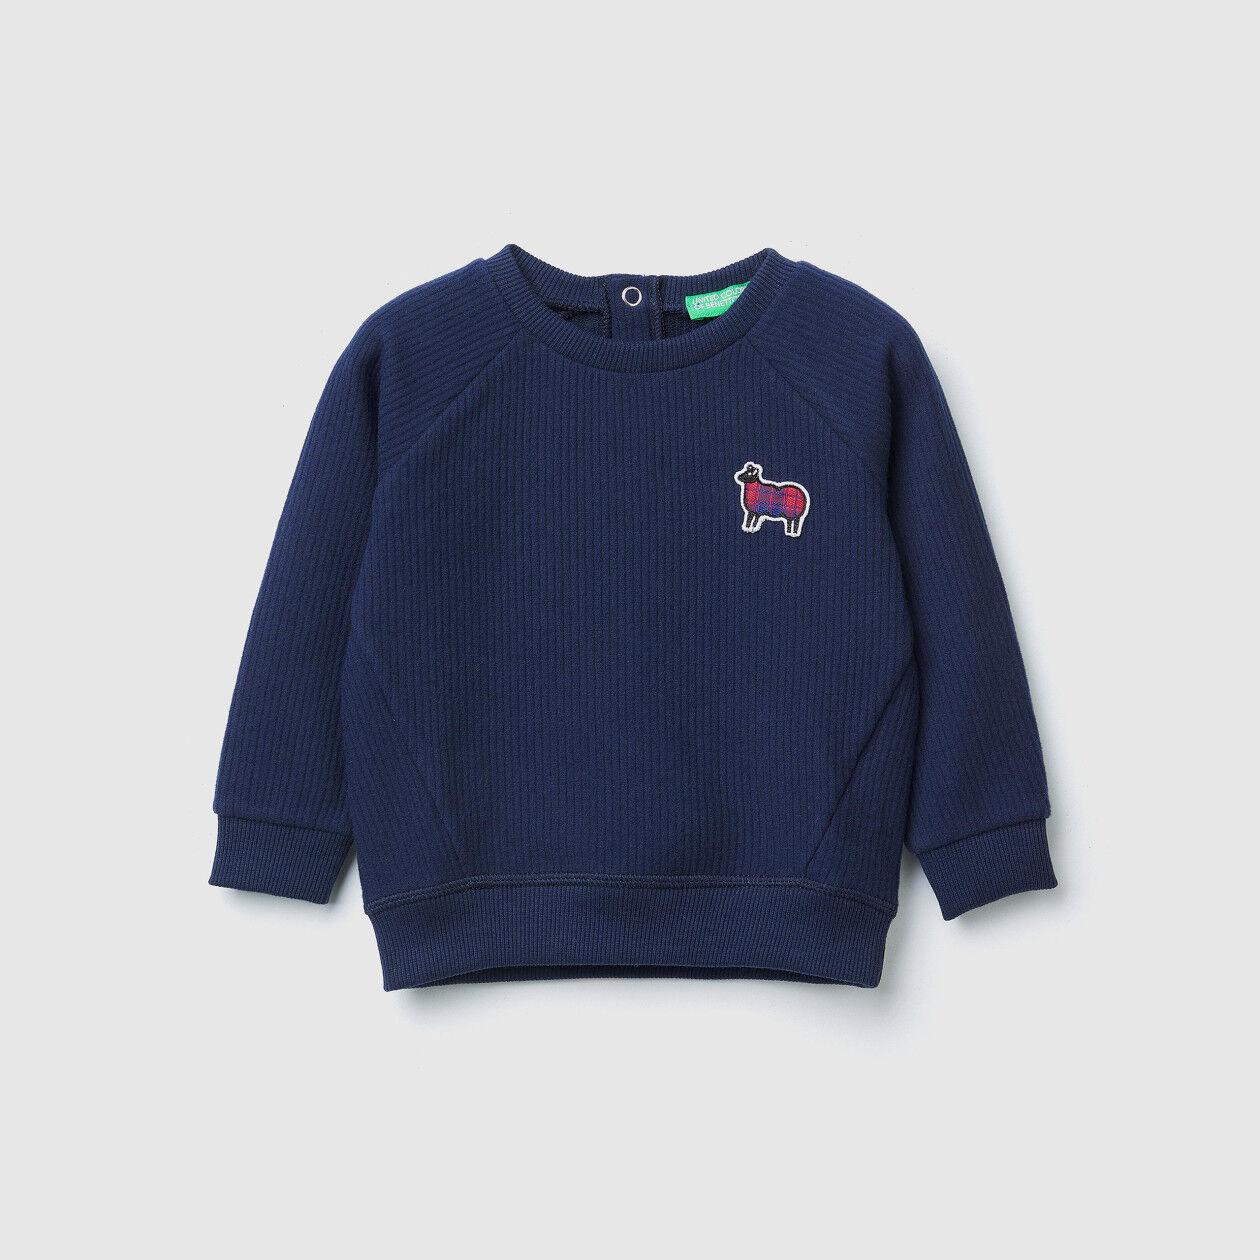 Crew neck sweatshirt with patches